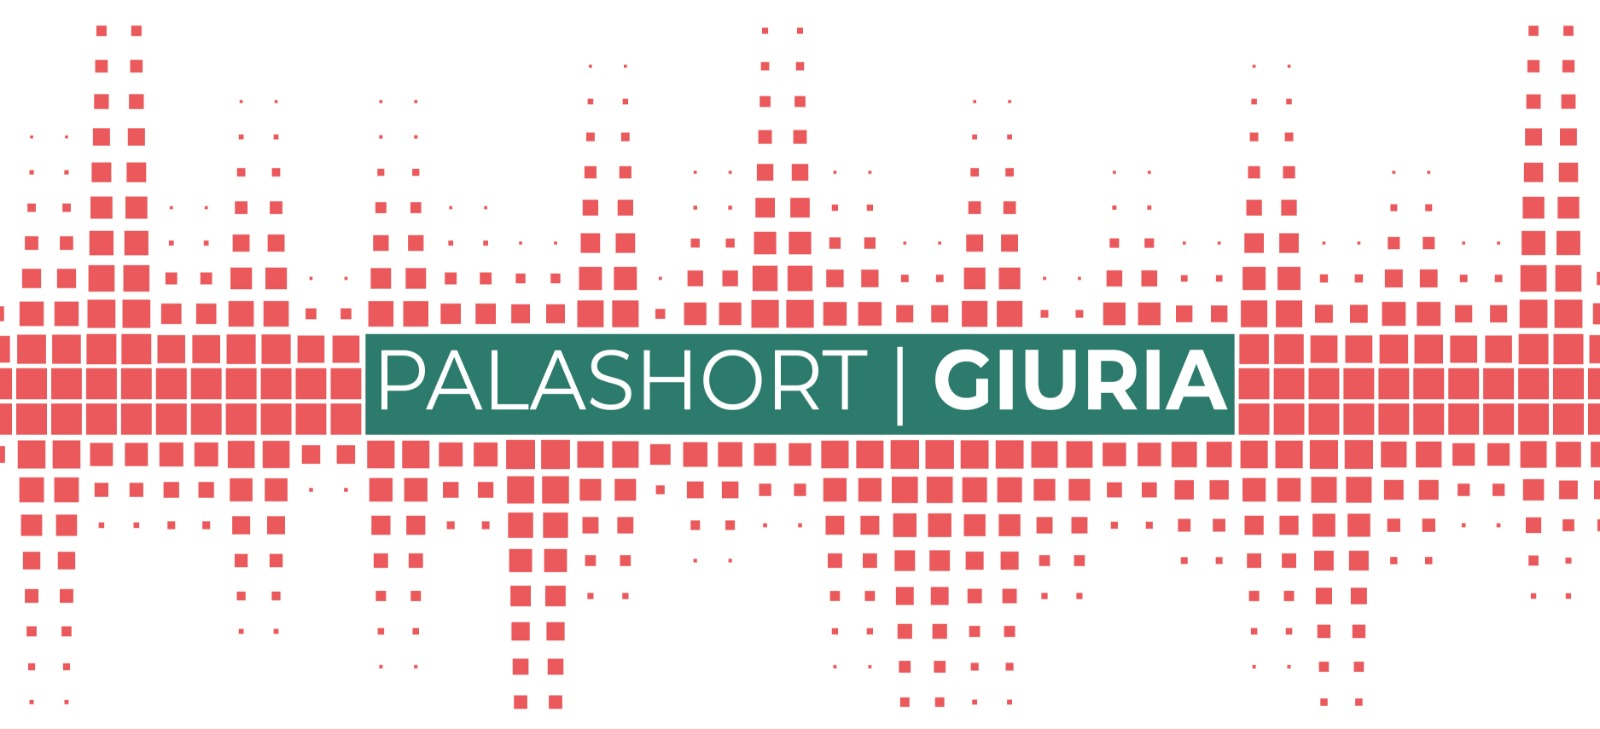 PALASHORT 2019: ECCO LA NOSTRA GIURIA DI ESPERTI!